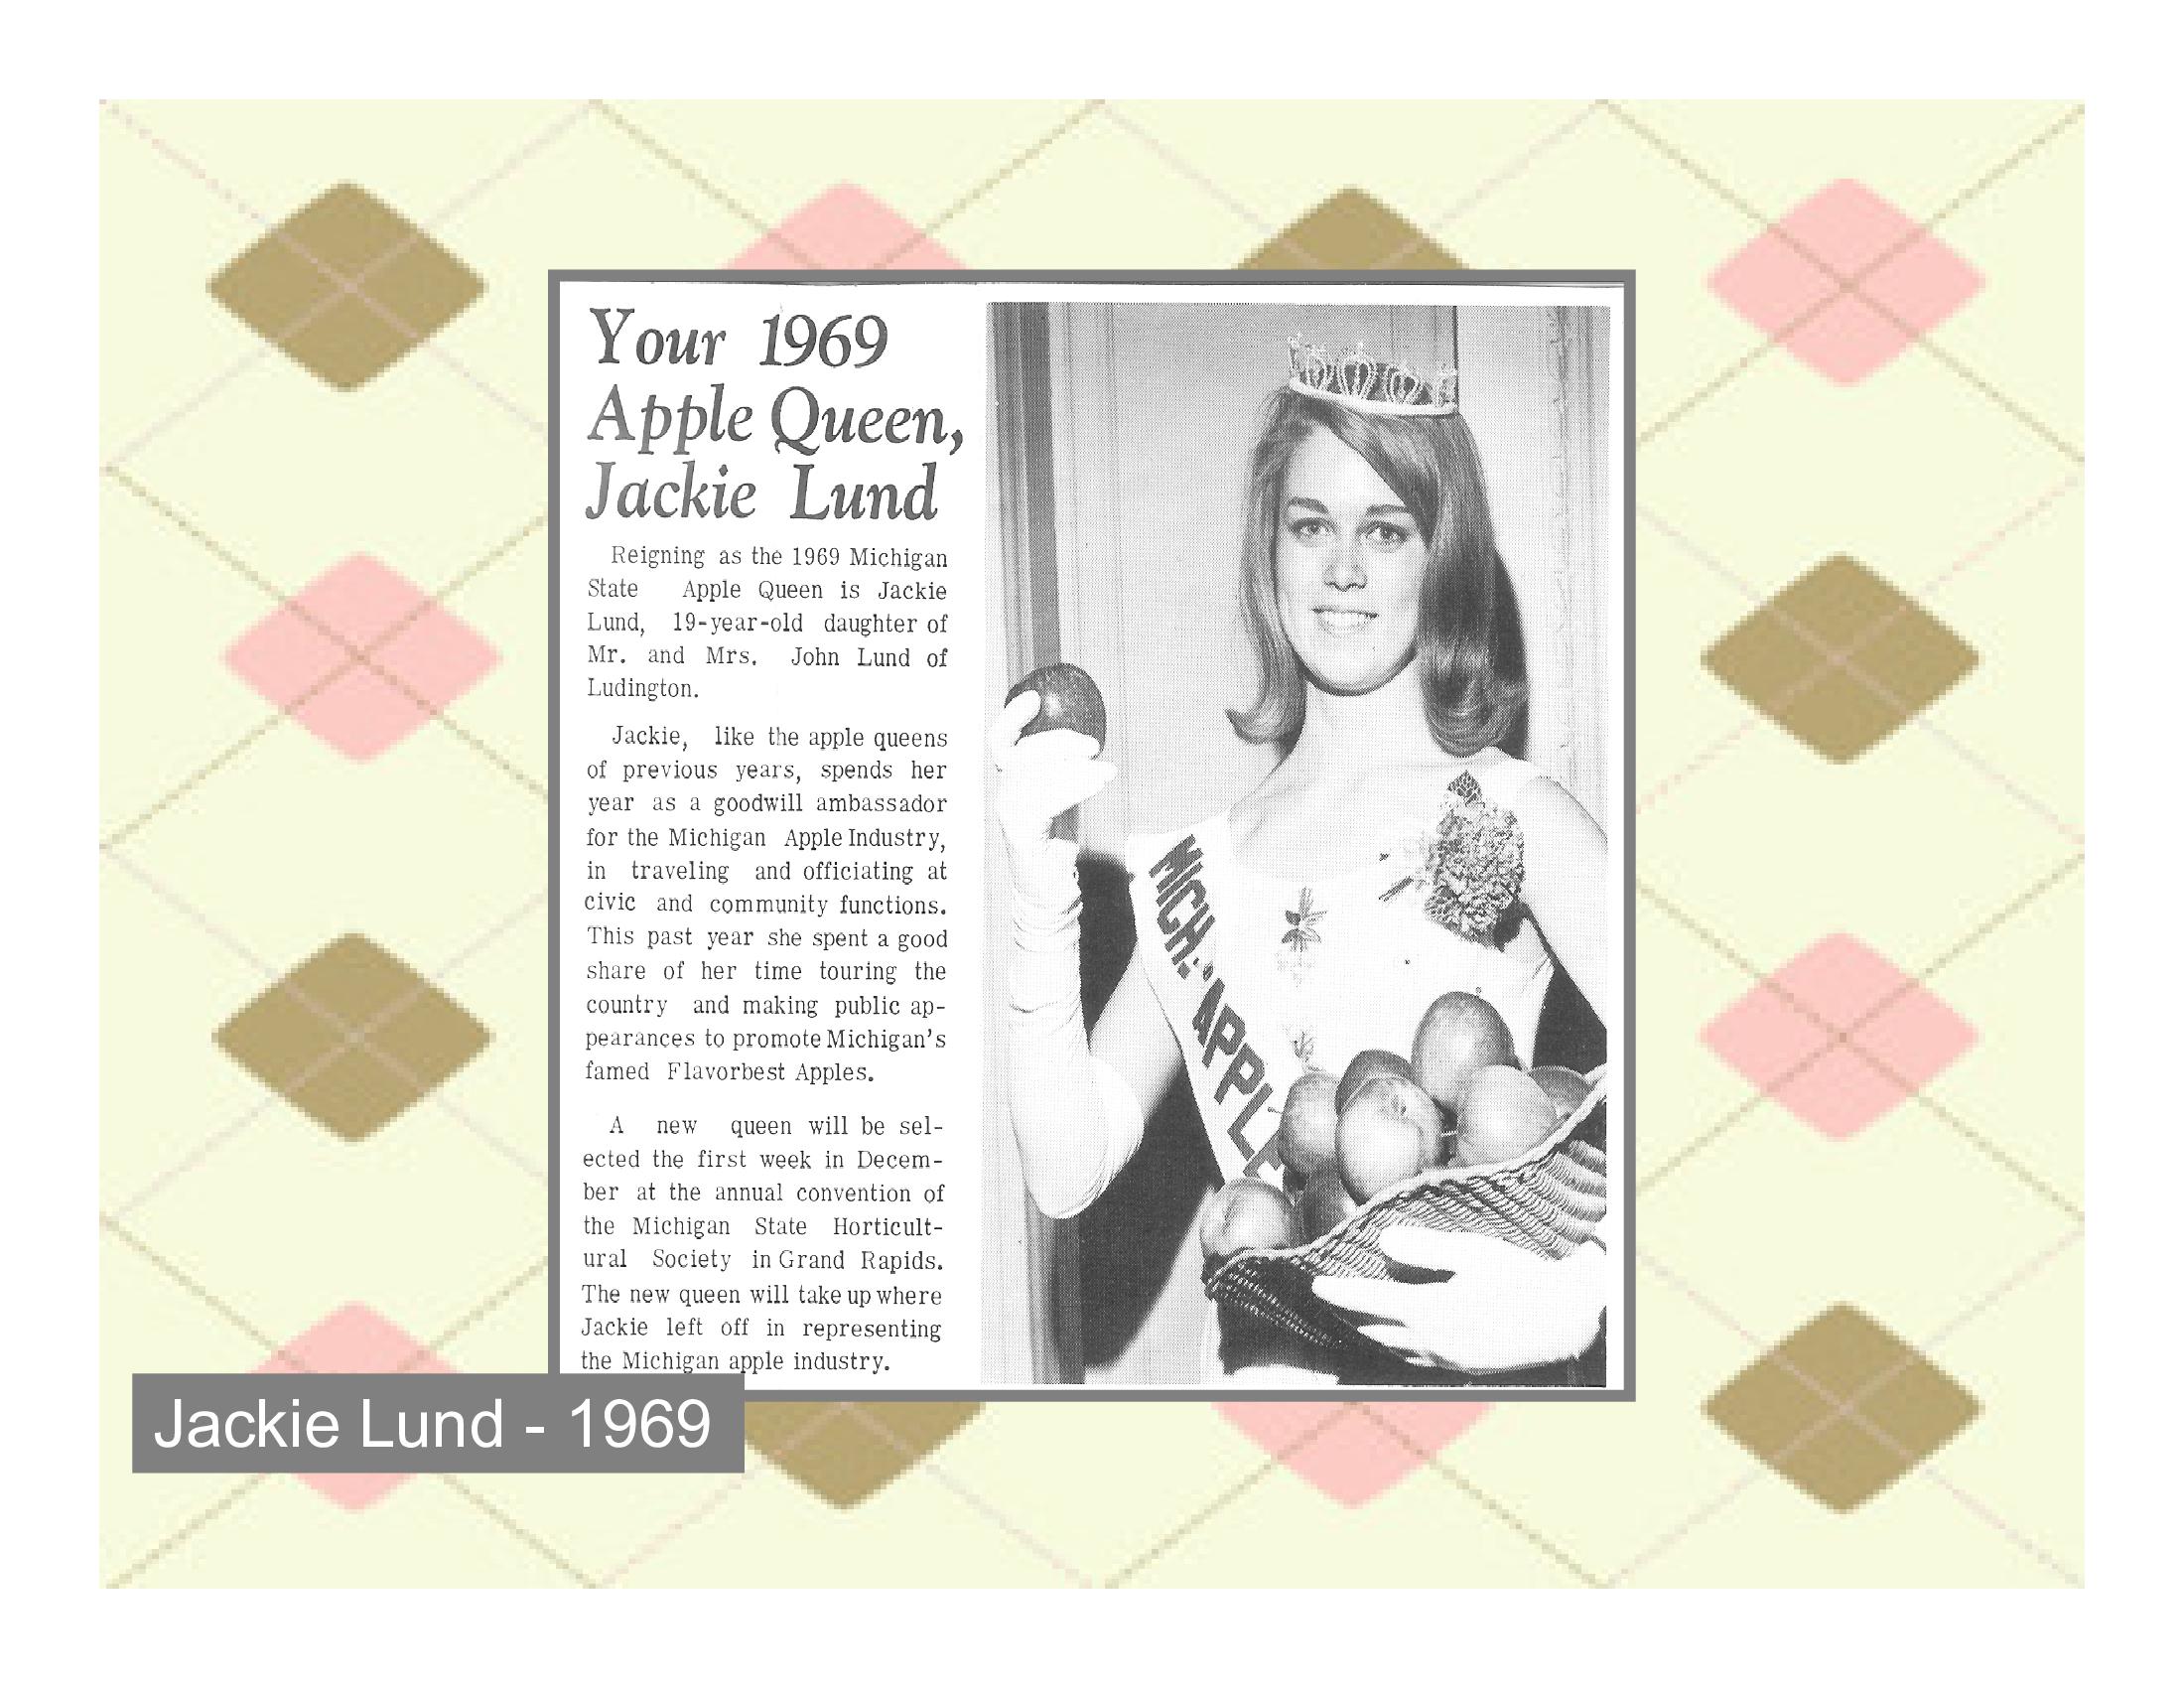 Jackie Lund - 1969